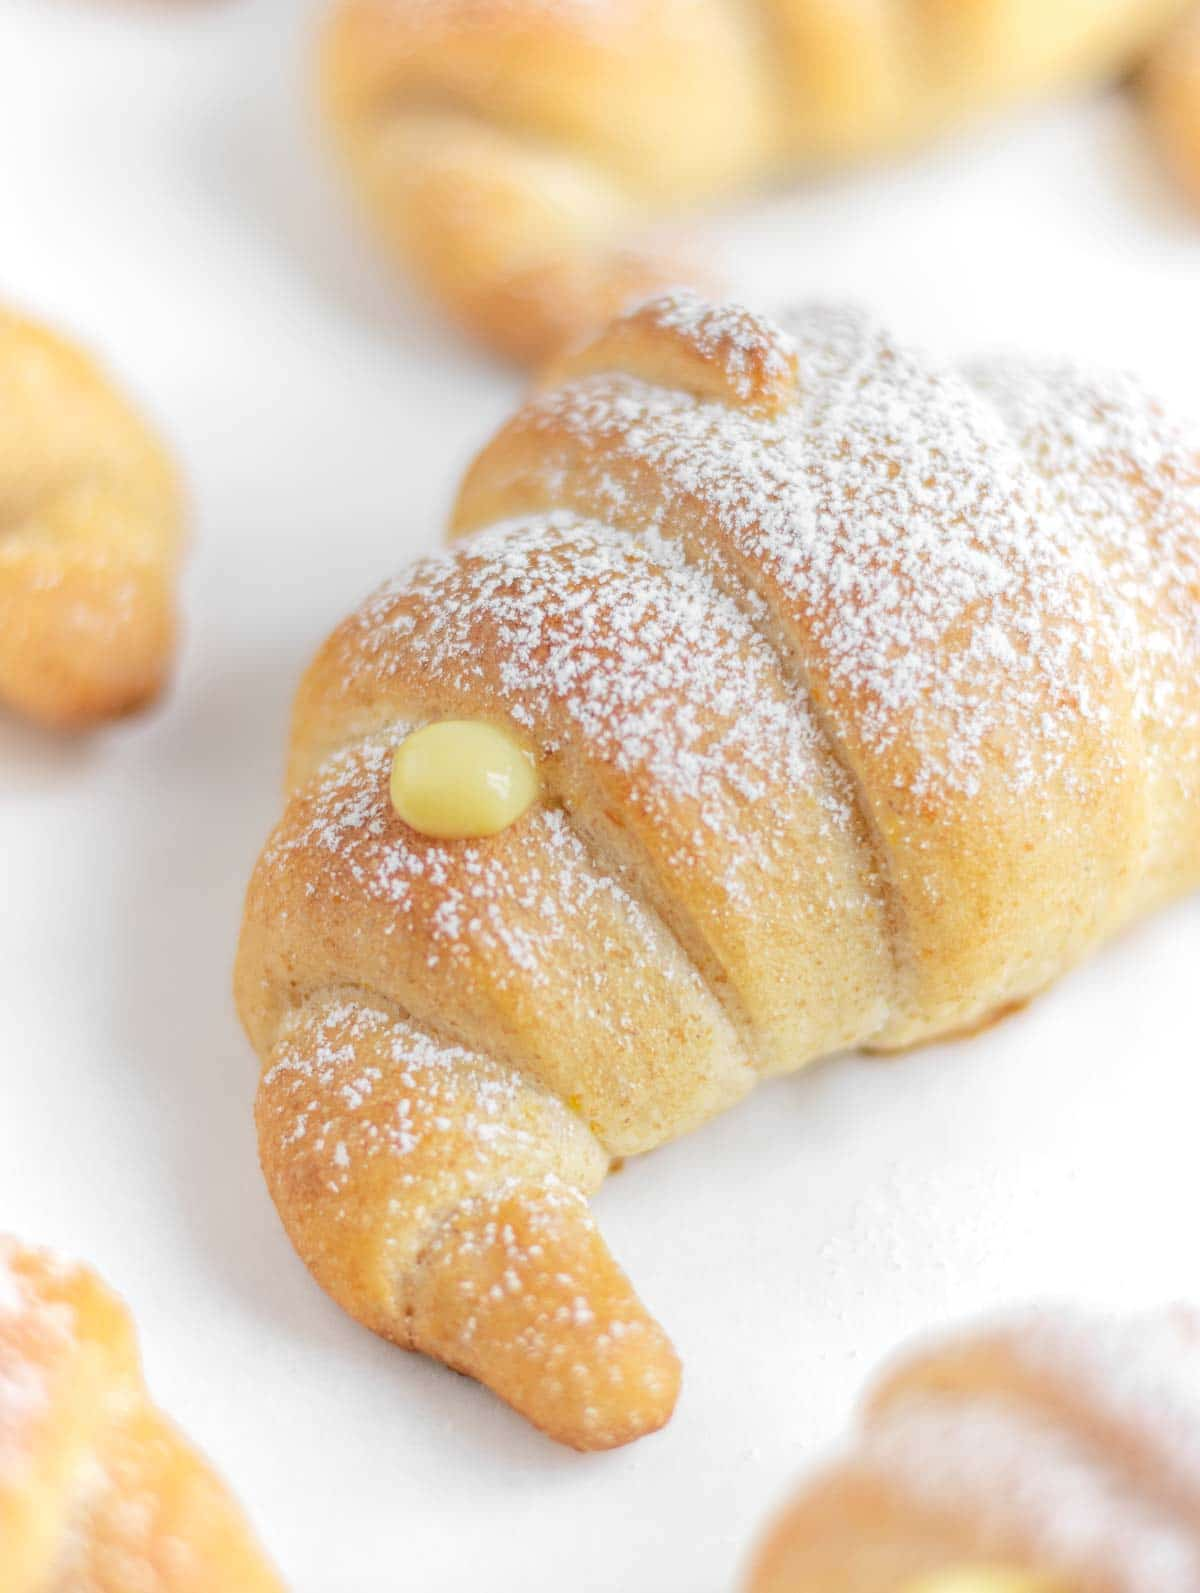 close up vegan brioche croissant